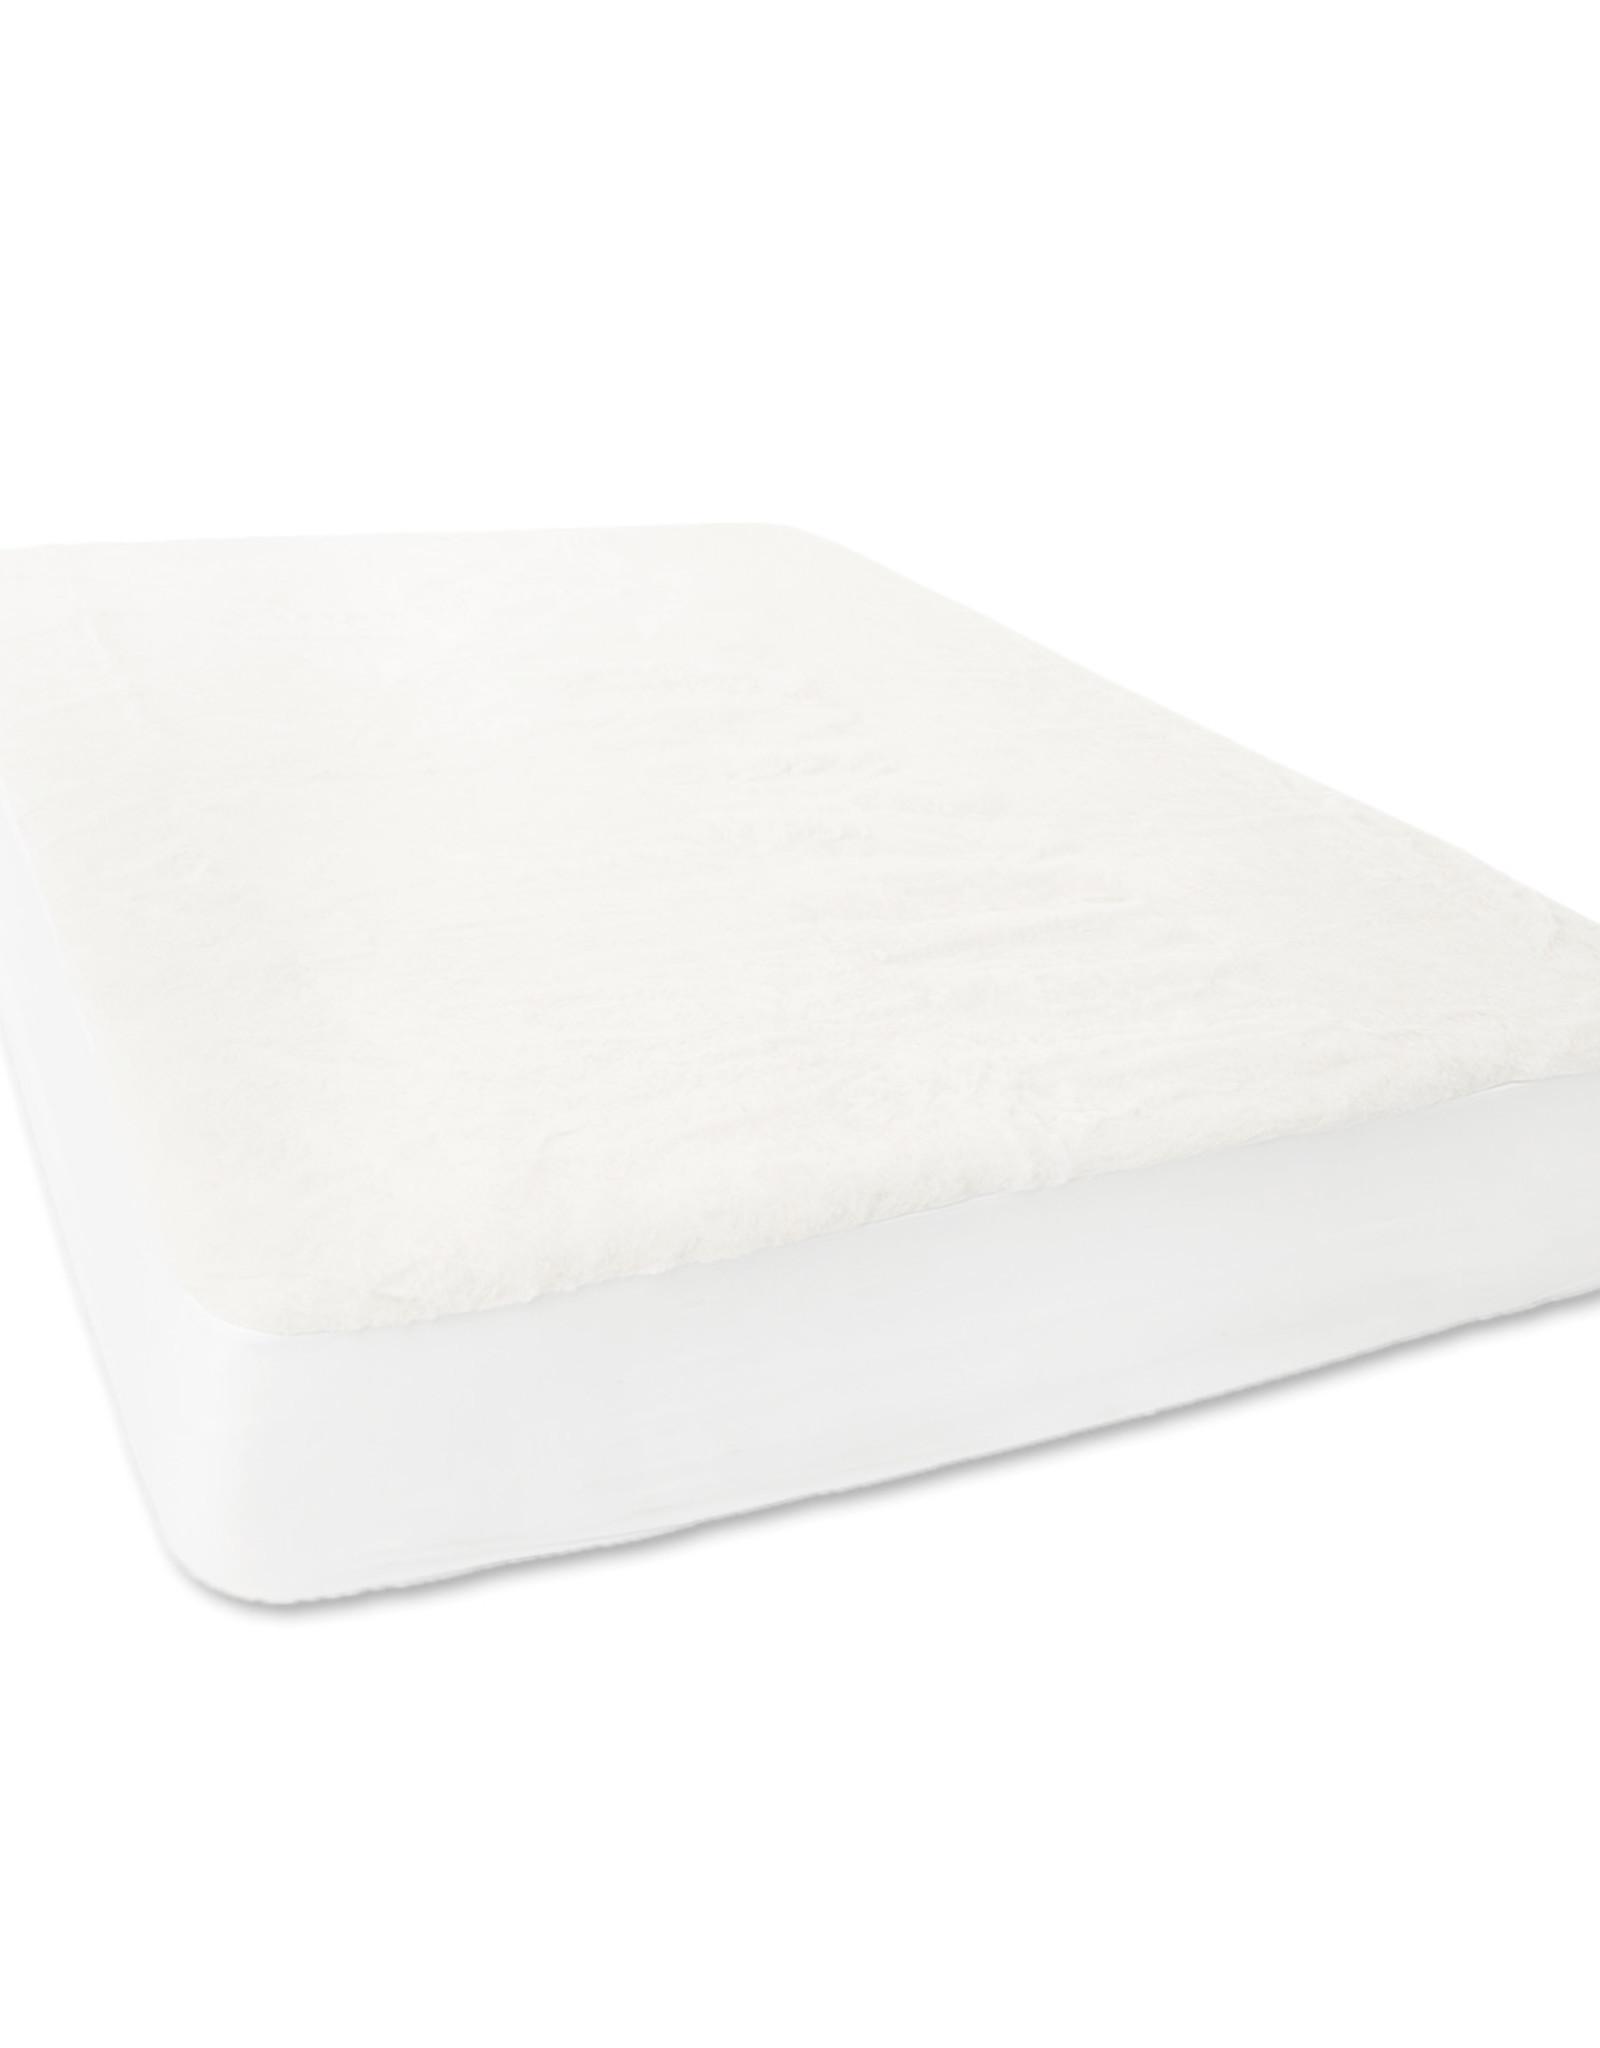 Malouf Mattress Protector Sleep Tite